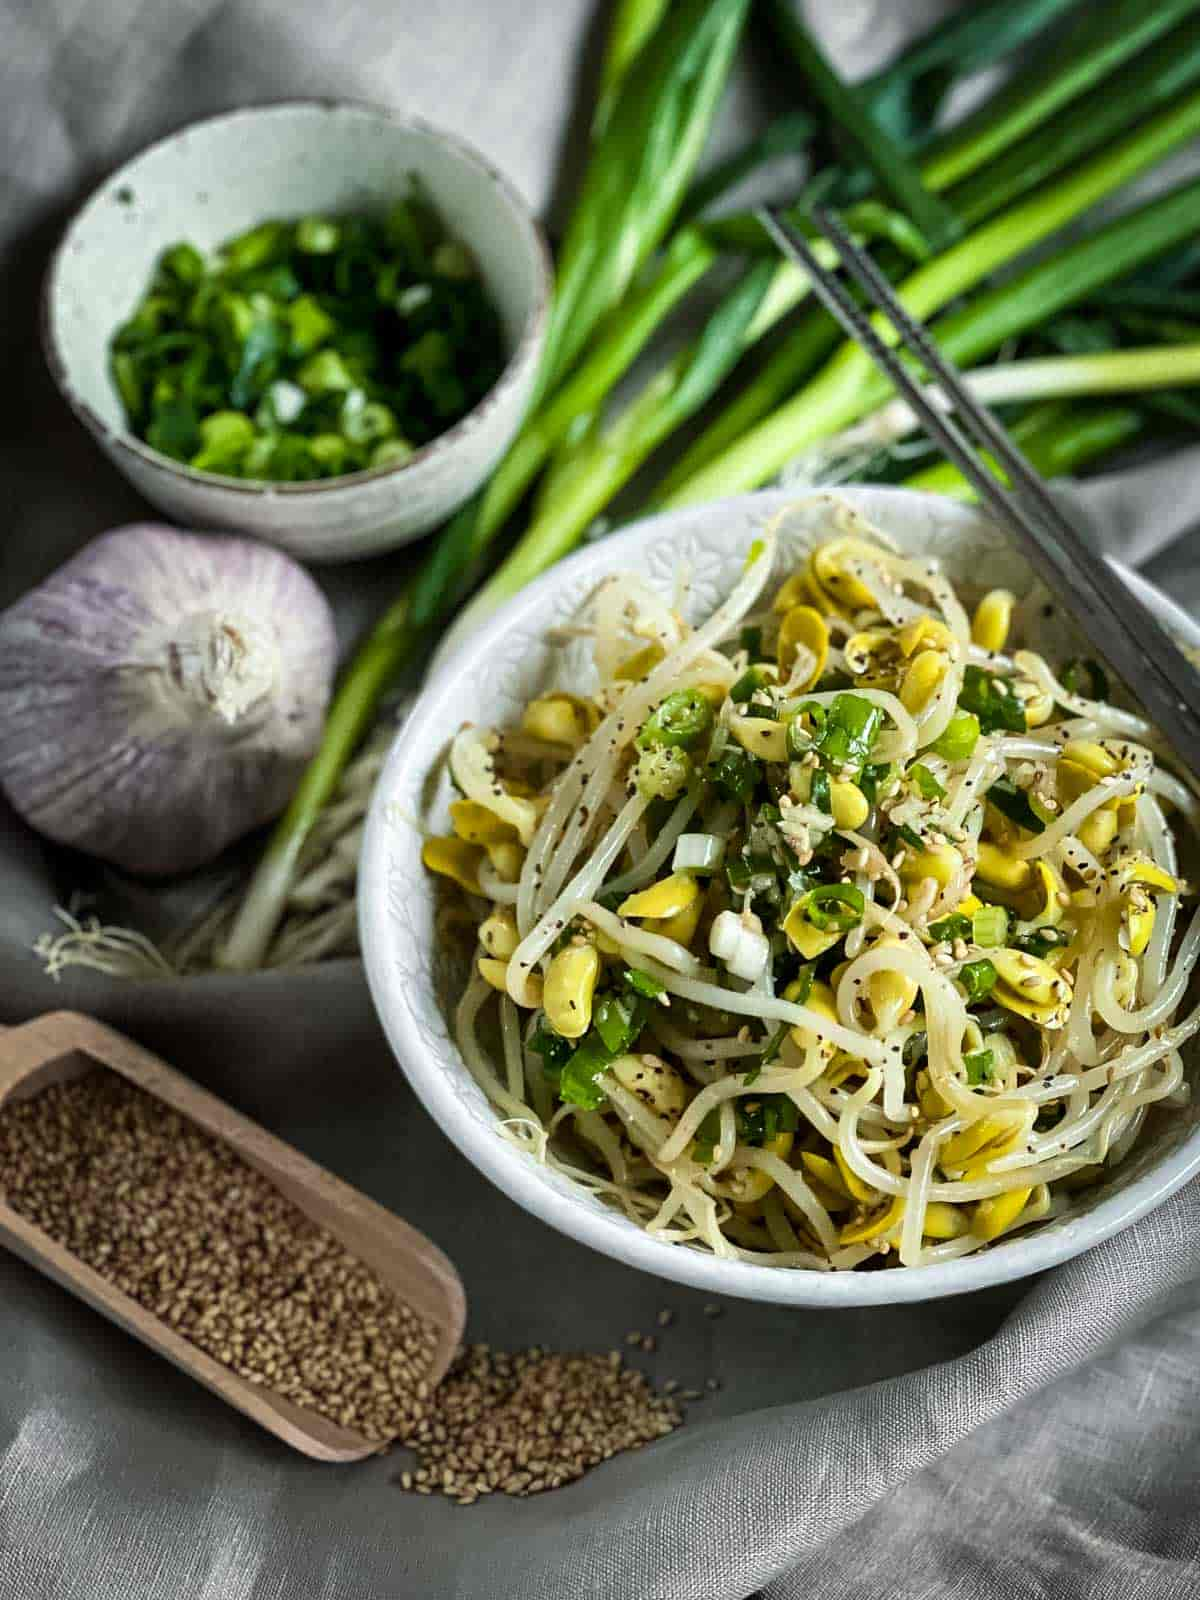 Korean Soybean Sprout Side Dish - Kongnamul Muchim